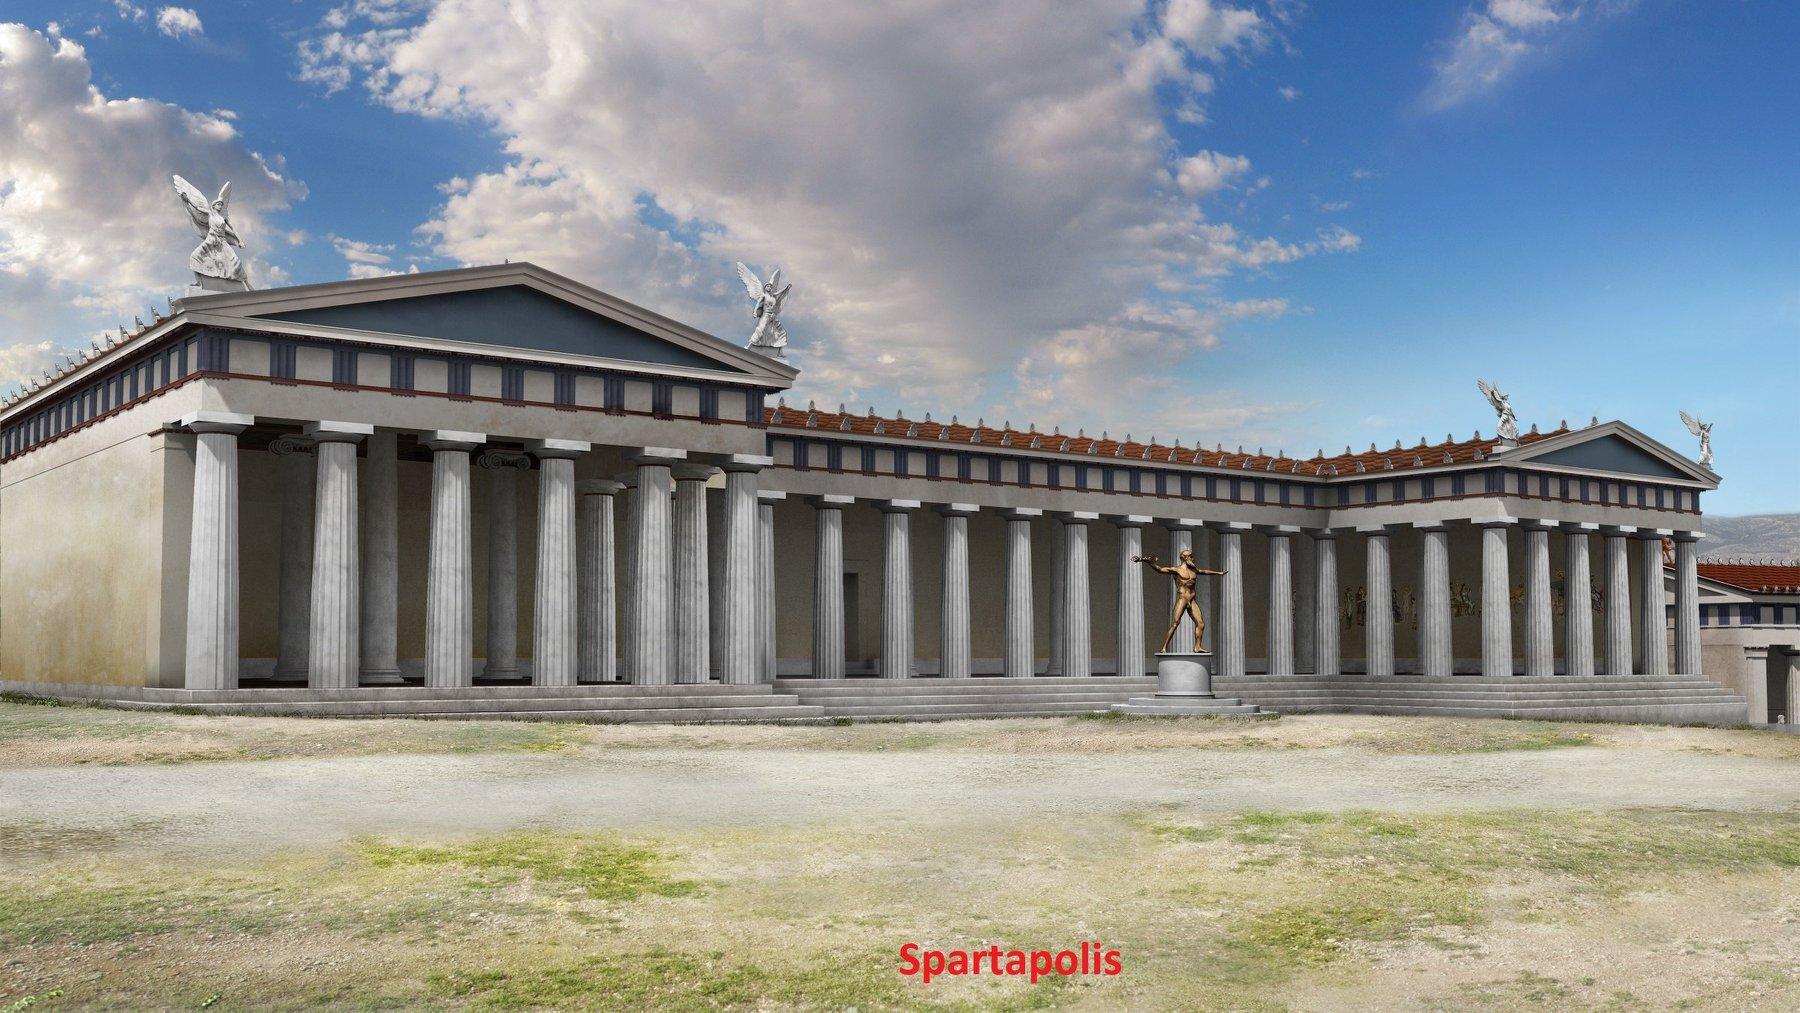 spartapolis_01.jpg